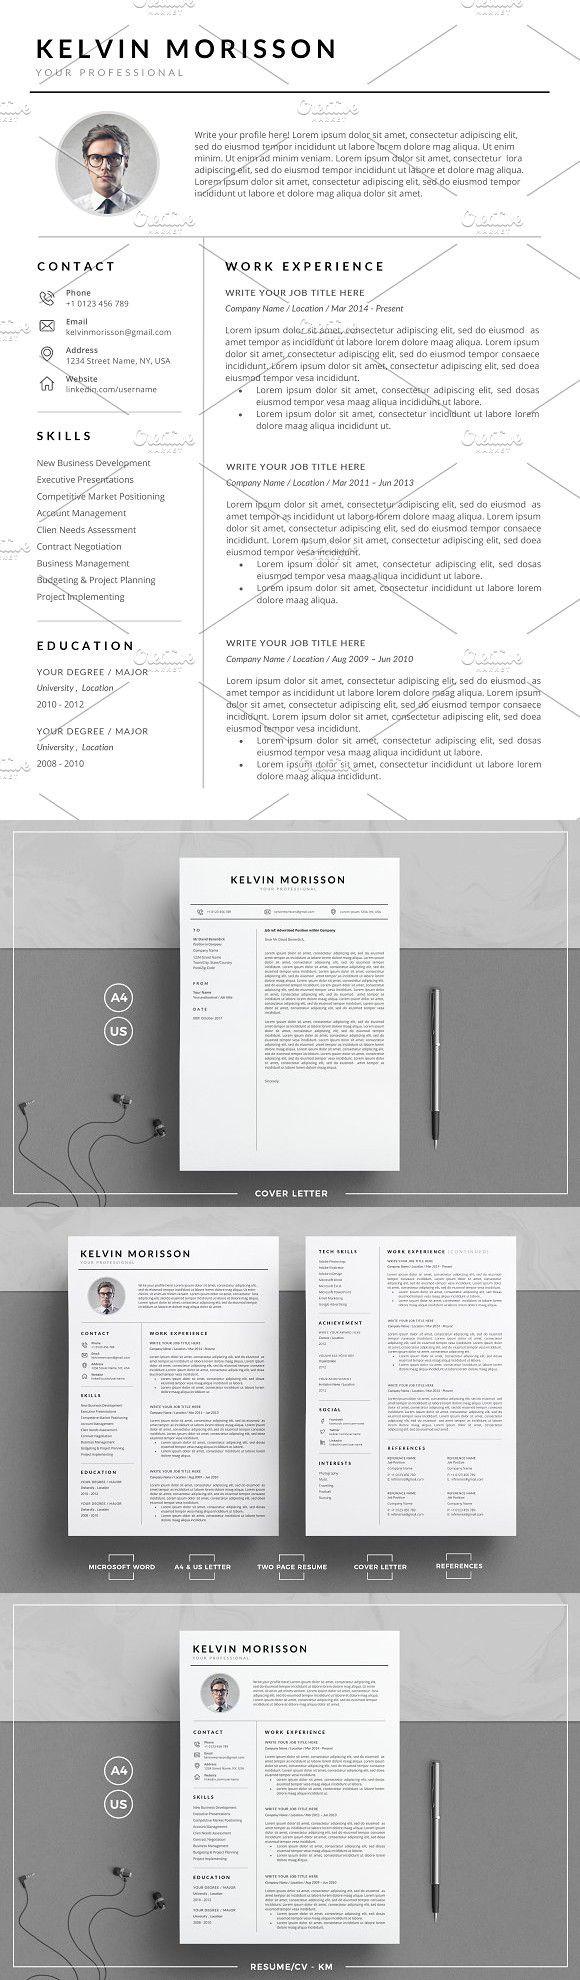 Resume/CV CM Simple resume template, Microsoft word